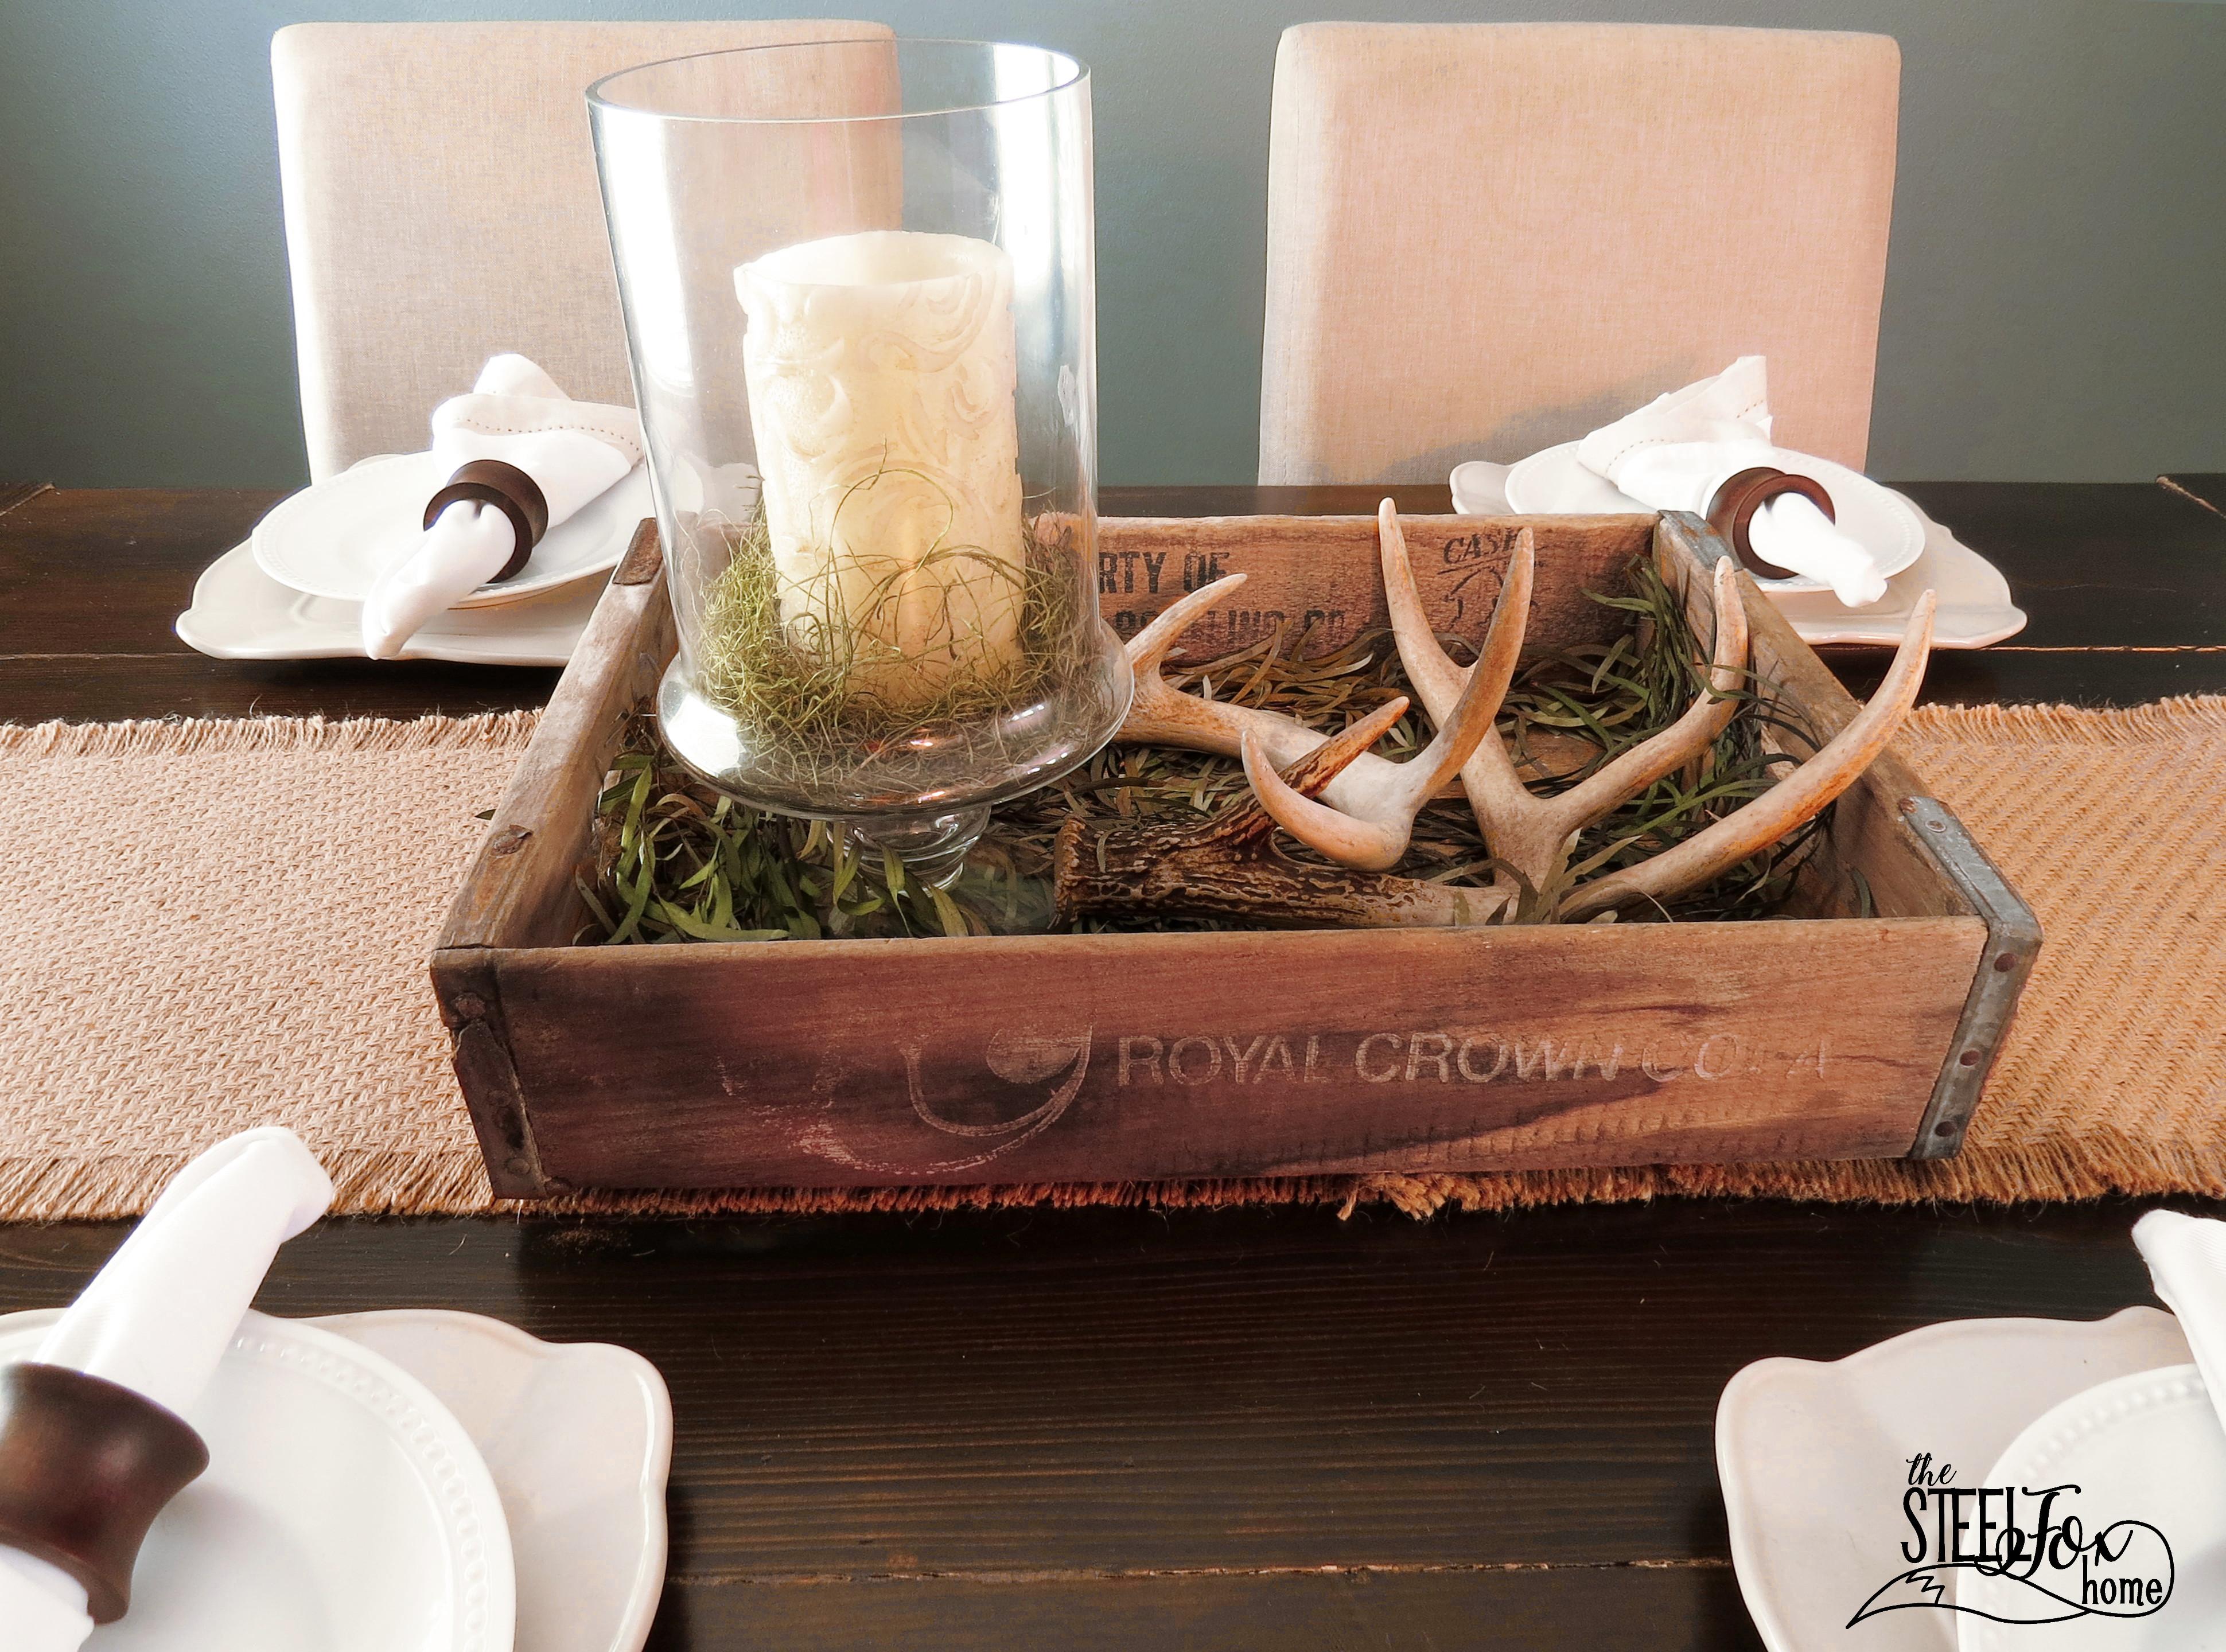 Gentil 4  Farmhouse Fixer Upper Dining Room Renovation Remodel Reveal Table Deer Antler  Centerpiece Patents Vintage